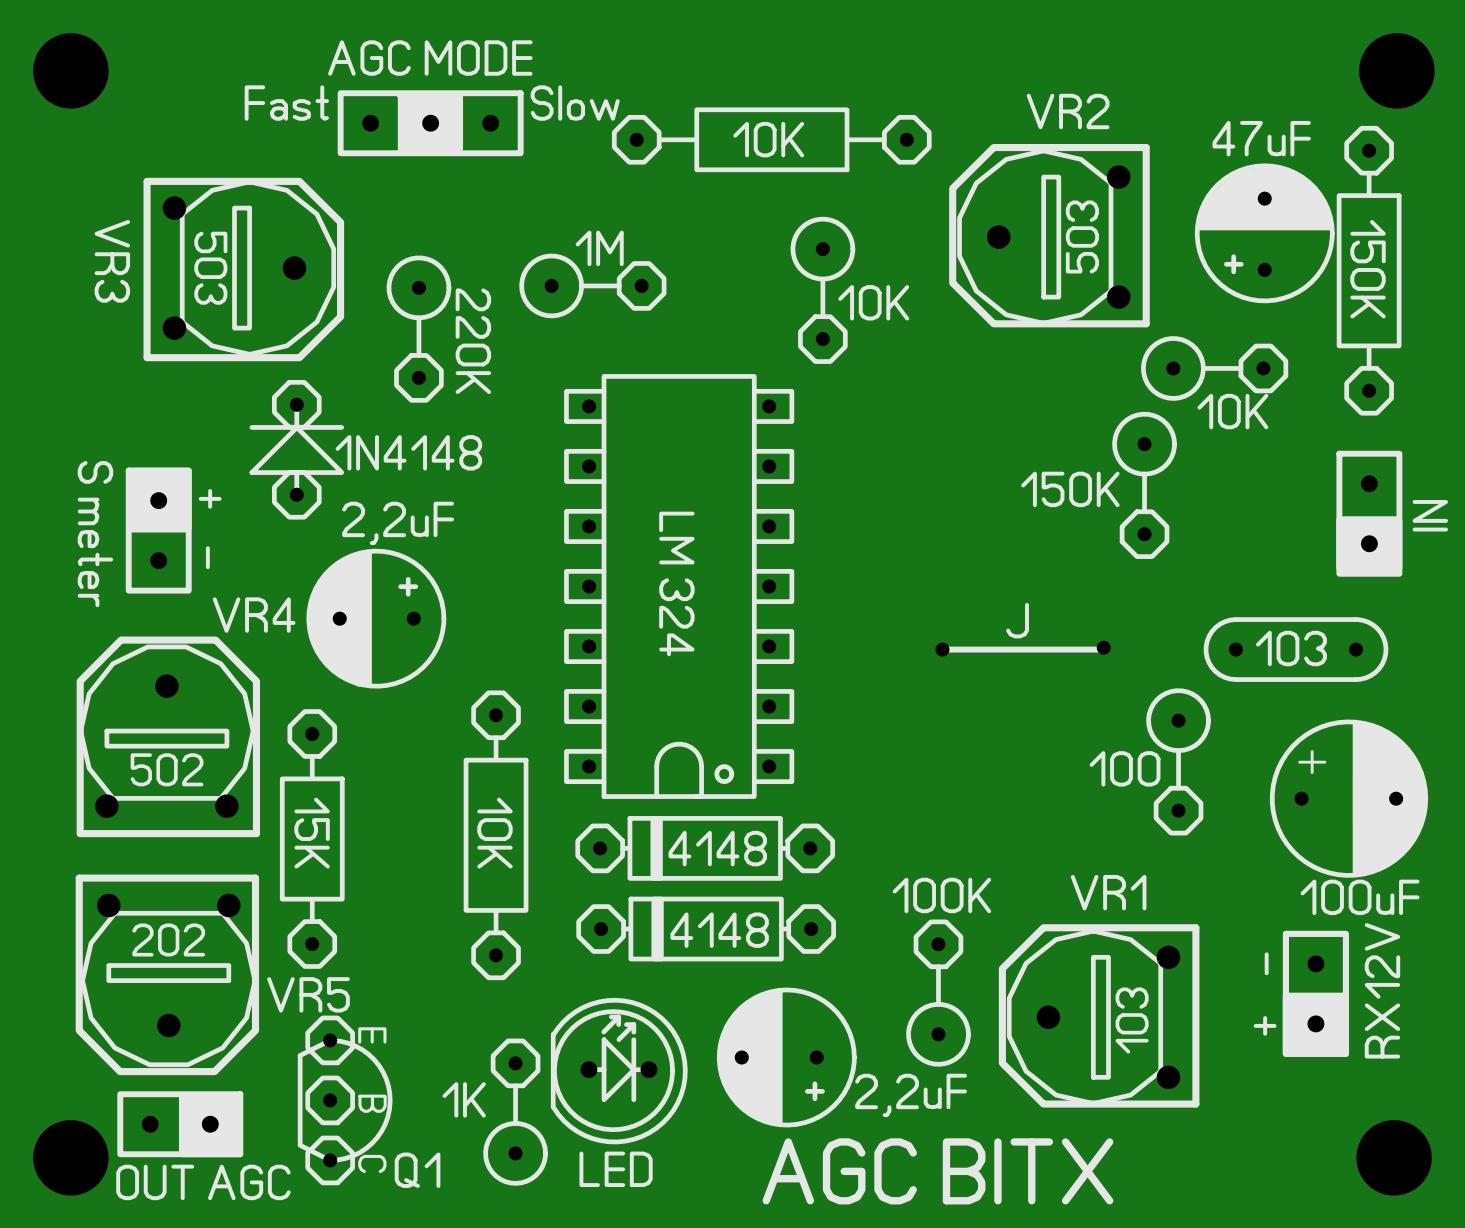 Buku Persamaan Ic Dan Transistor Radios Myfreestaff Power Amplifier Otl For Cassette Radio Booster It Have